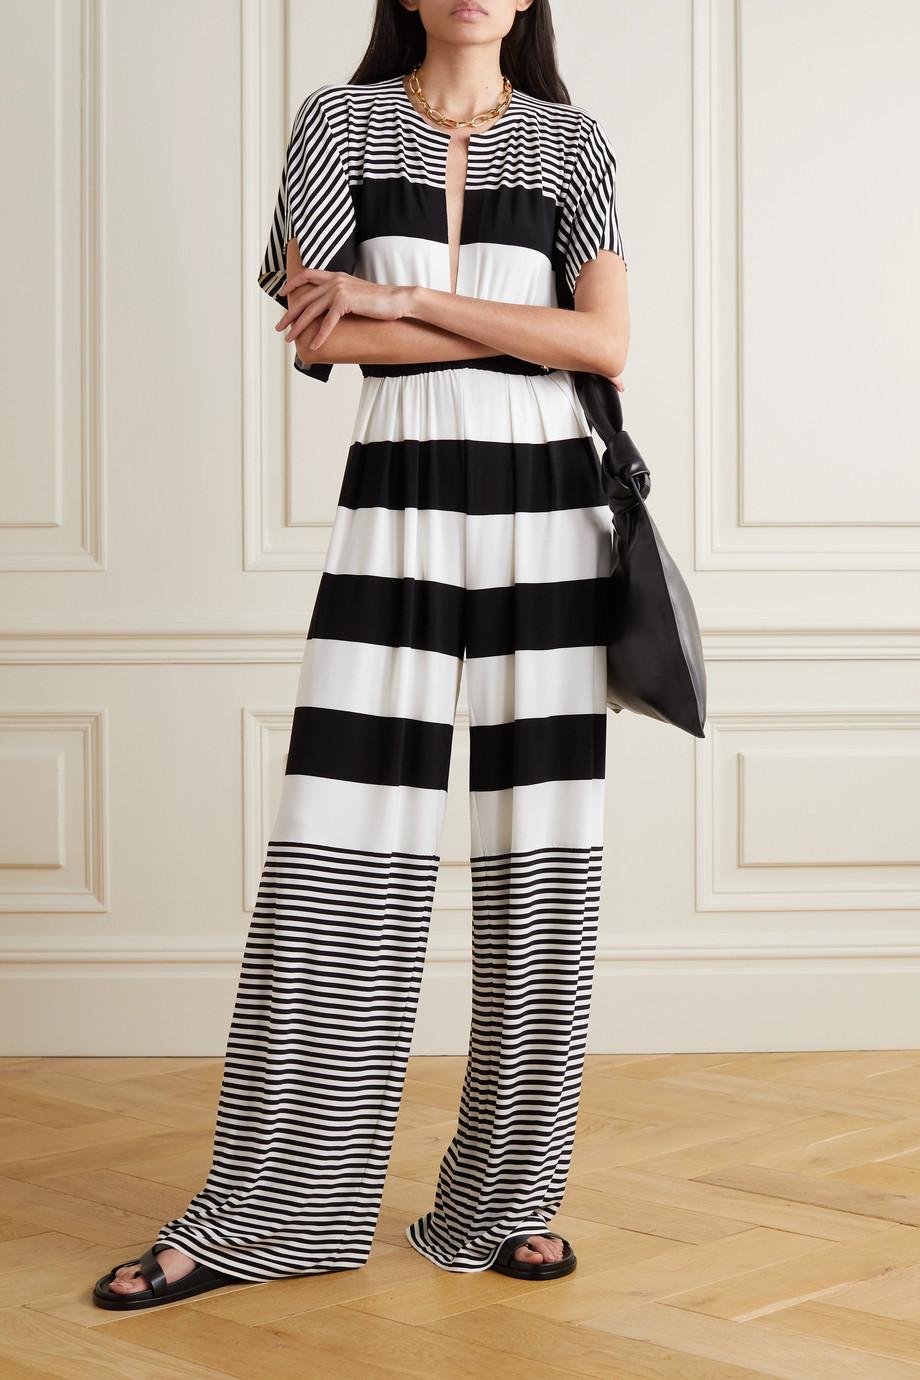 Norma Kamali Combi-pantalon en crêpe stretch à rayures